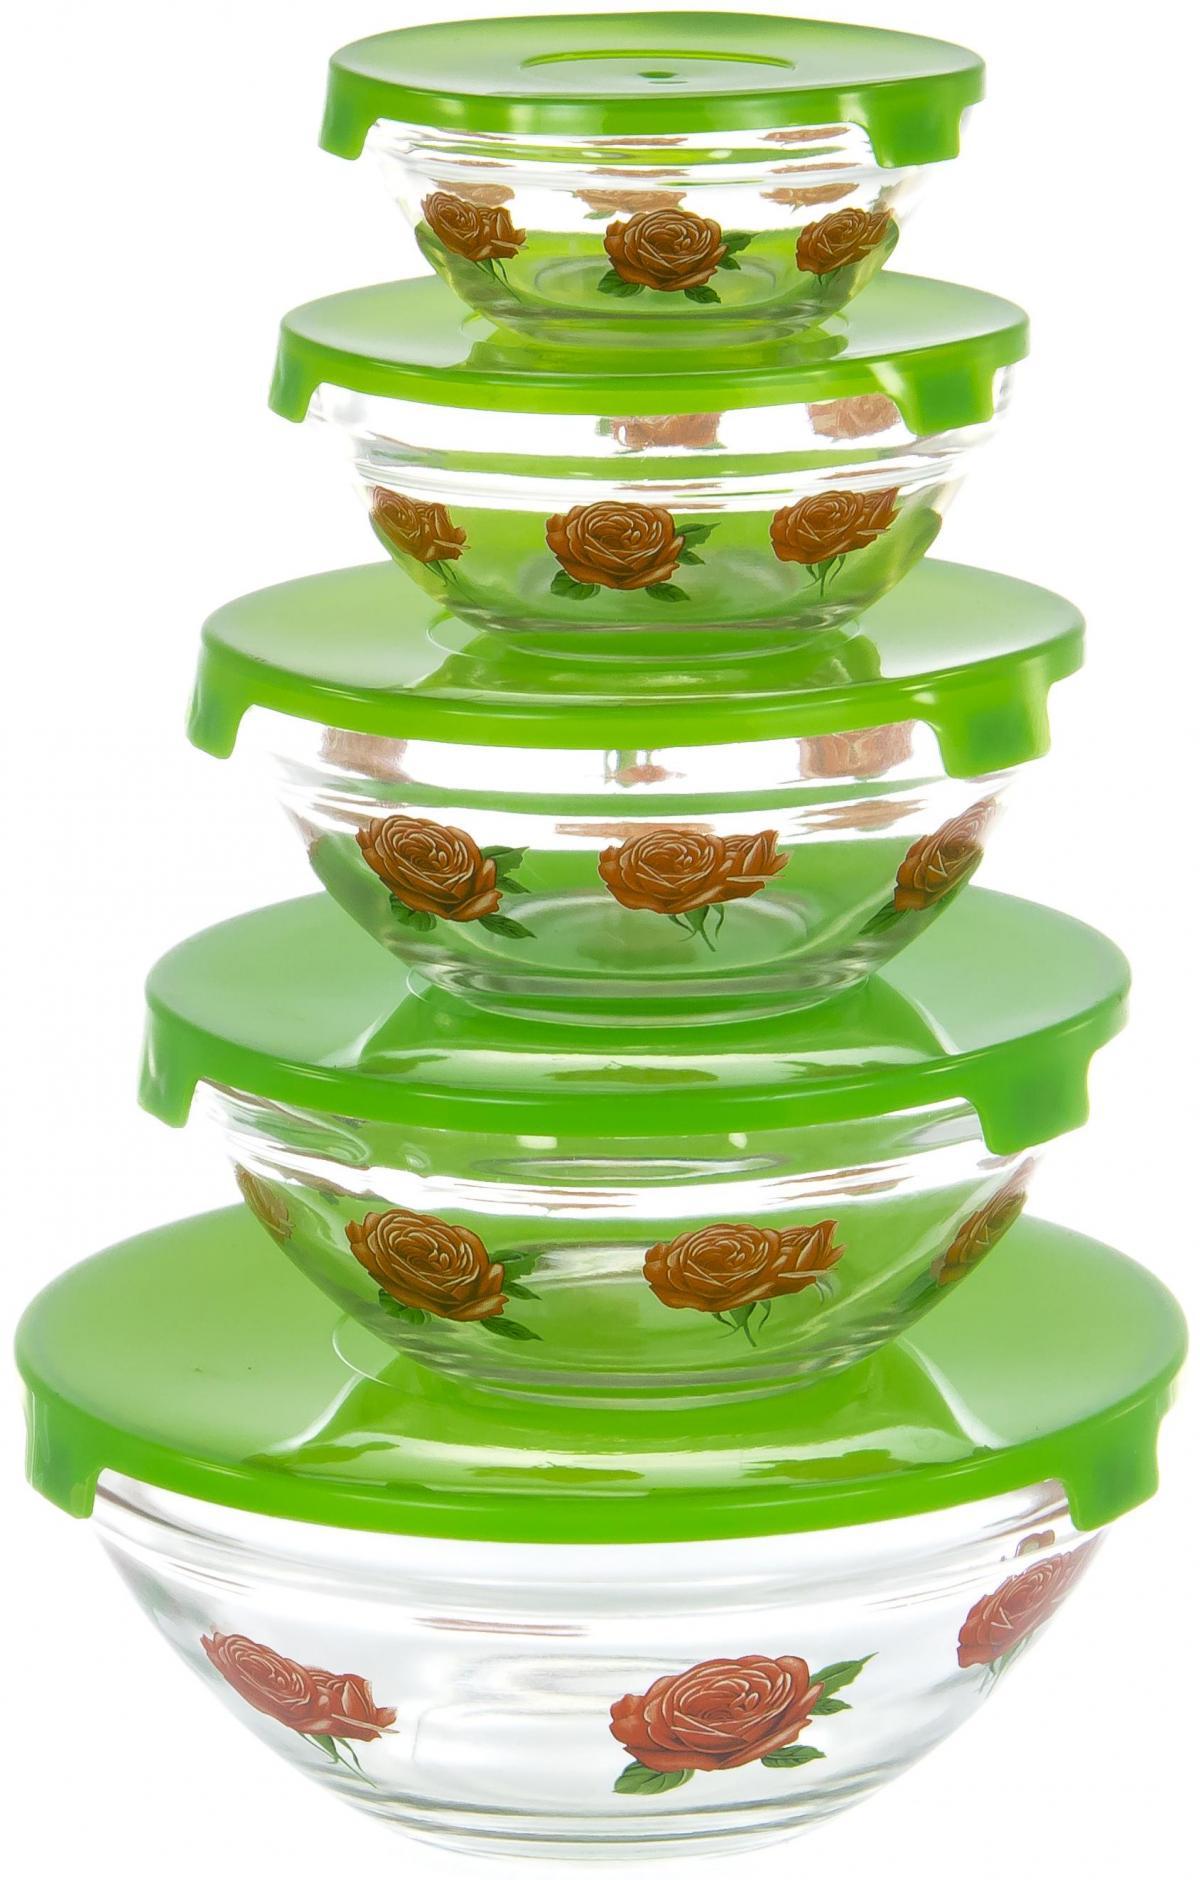 Набор салатников Olaff, с крышкой, 5 предметов. AX-5SB-G-01AX-5SB-G-01набор 5 салатников d-100мм, 103мм, 125мм, 140мм, 170мм с пластик.крышками, подарочная упаковка